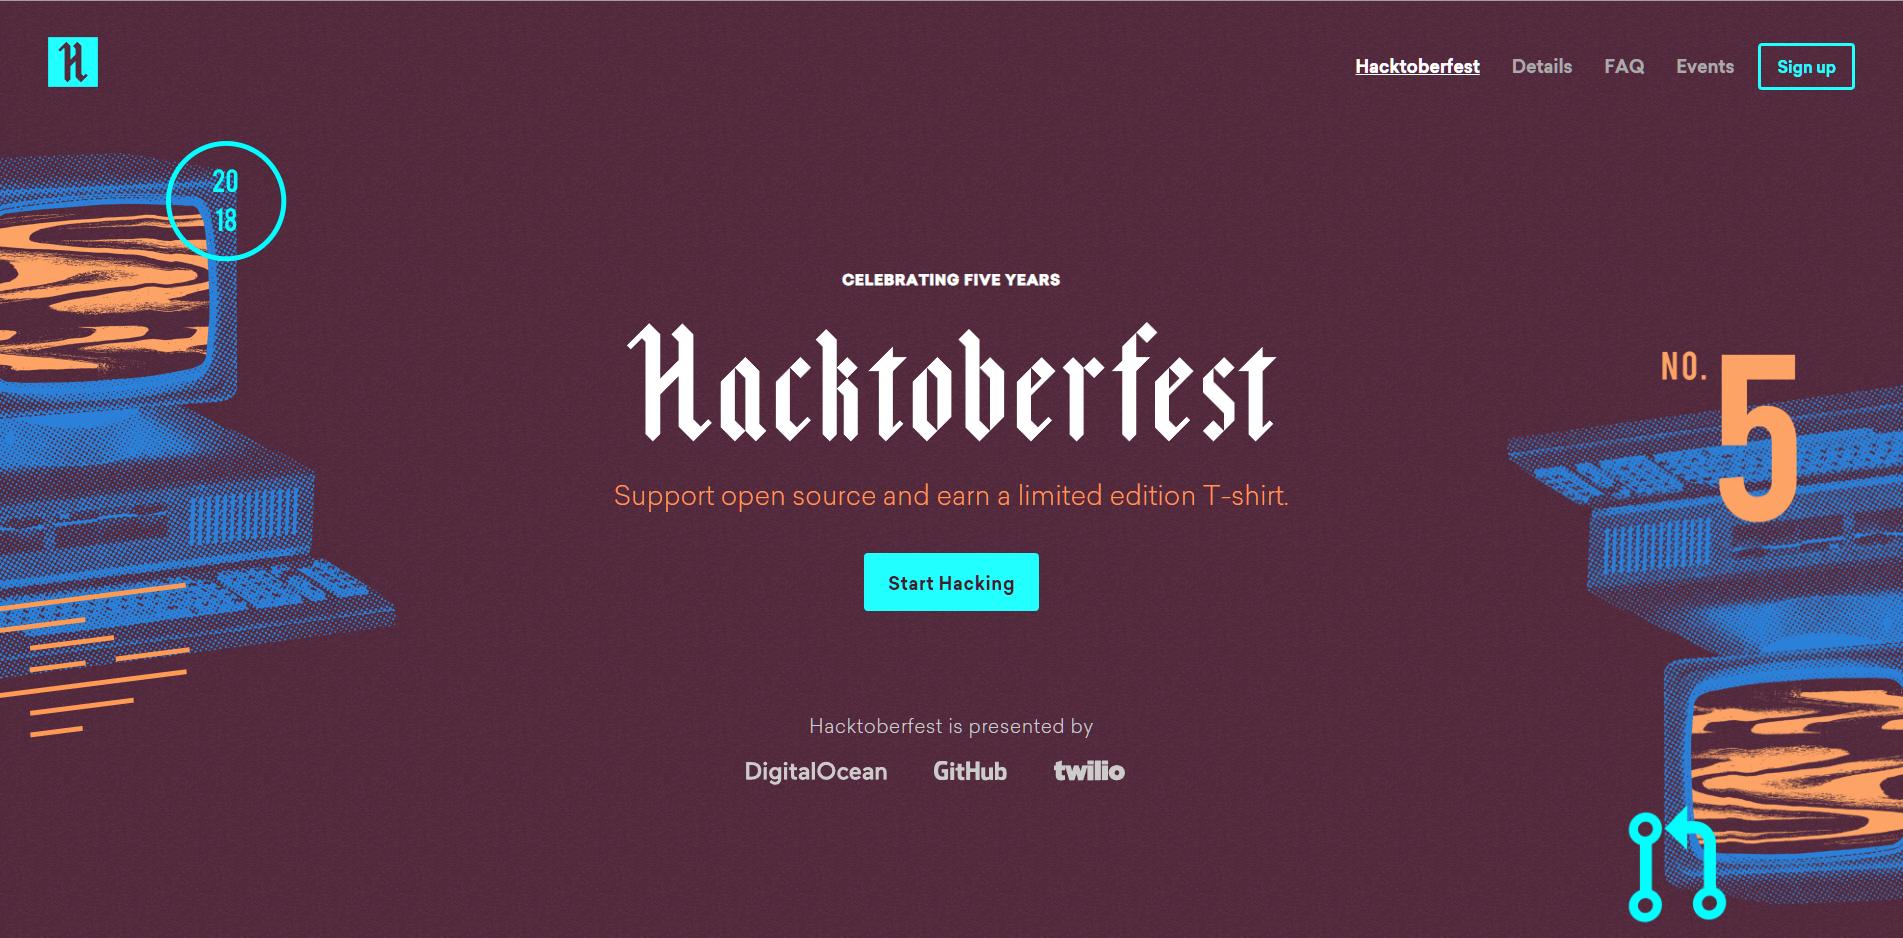 Hacktoberfest 2018:貢獻開源專案拿免費 T-Shirt